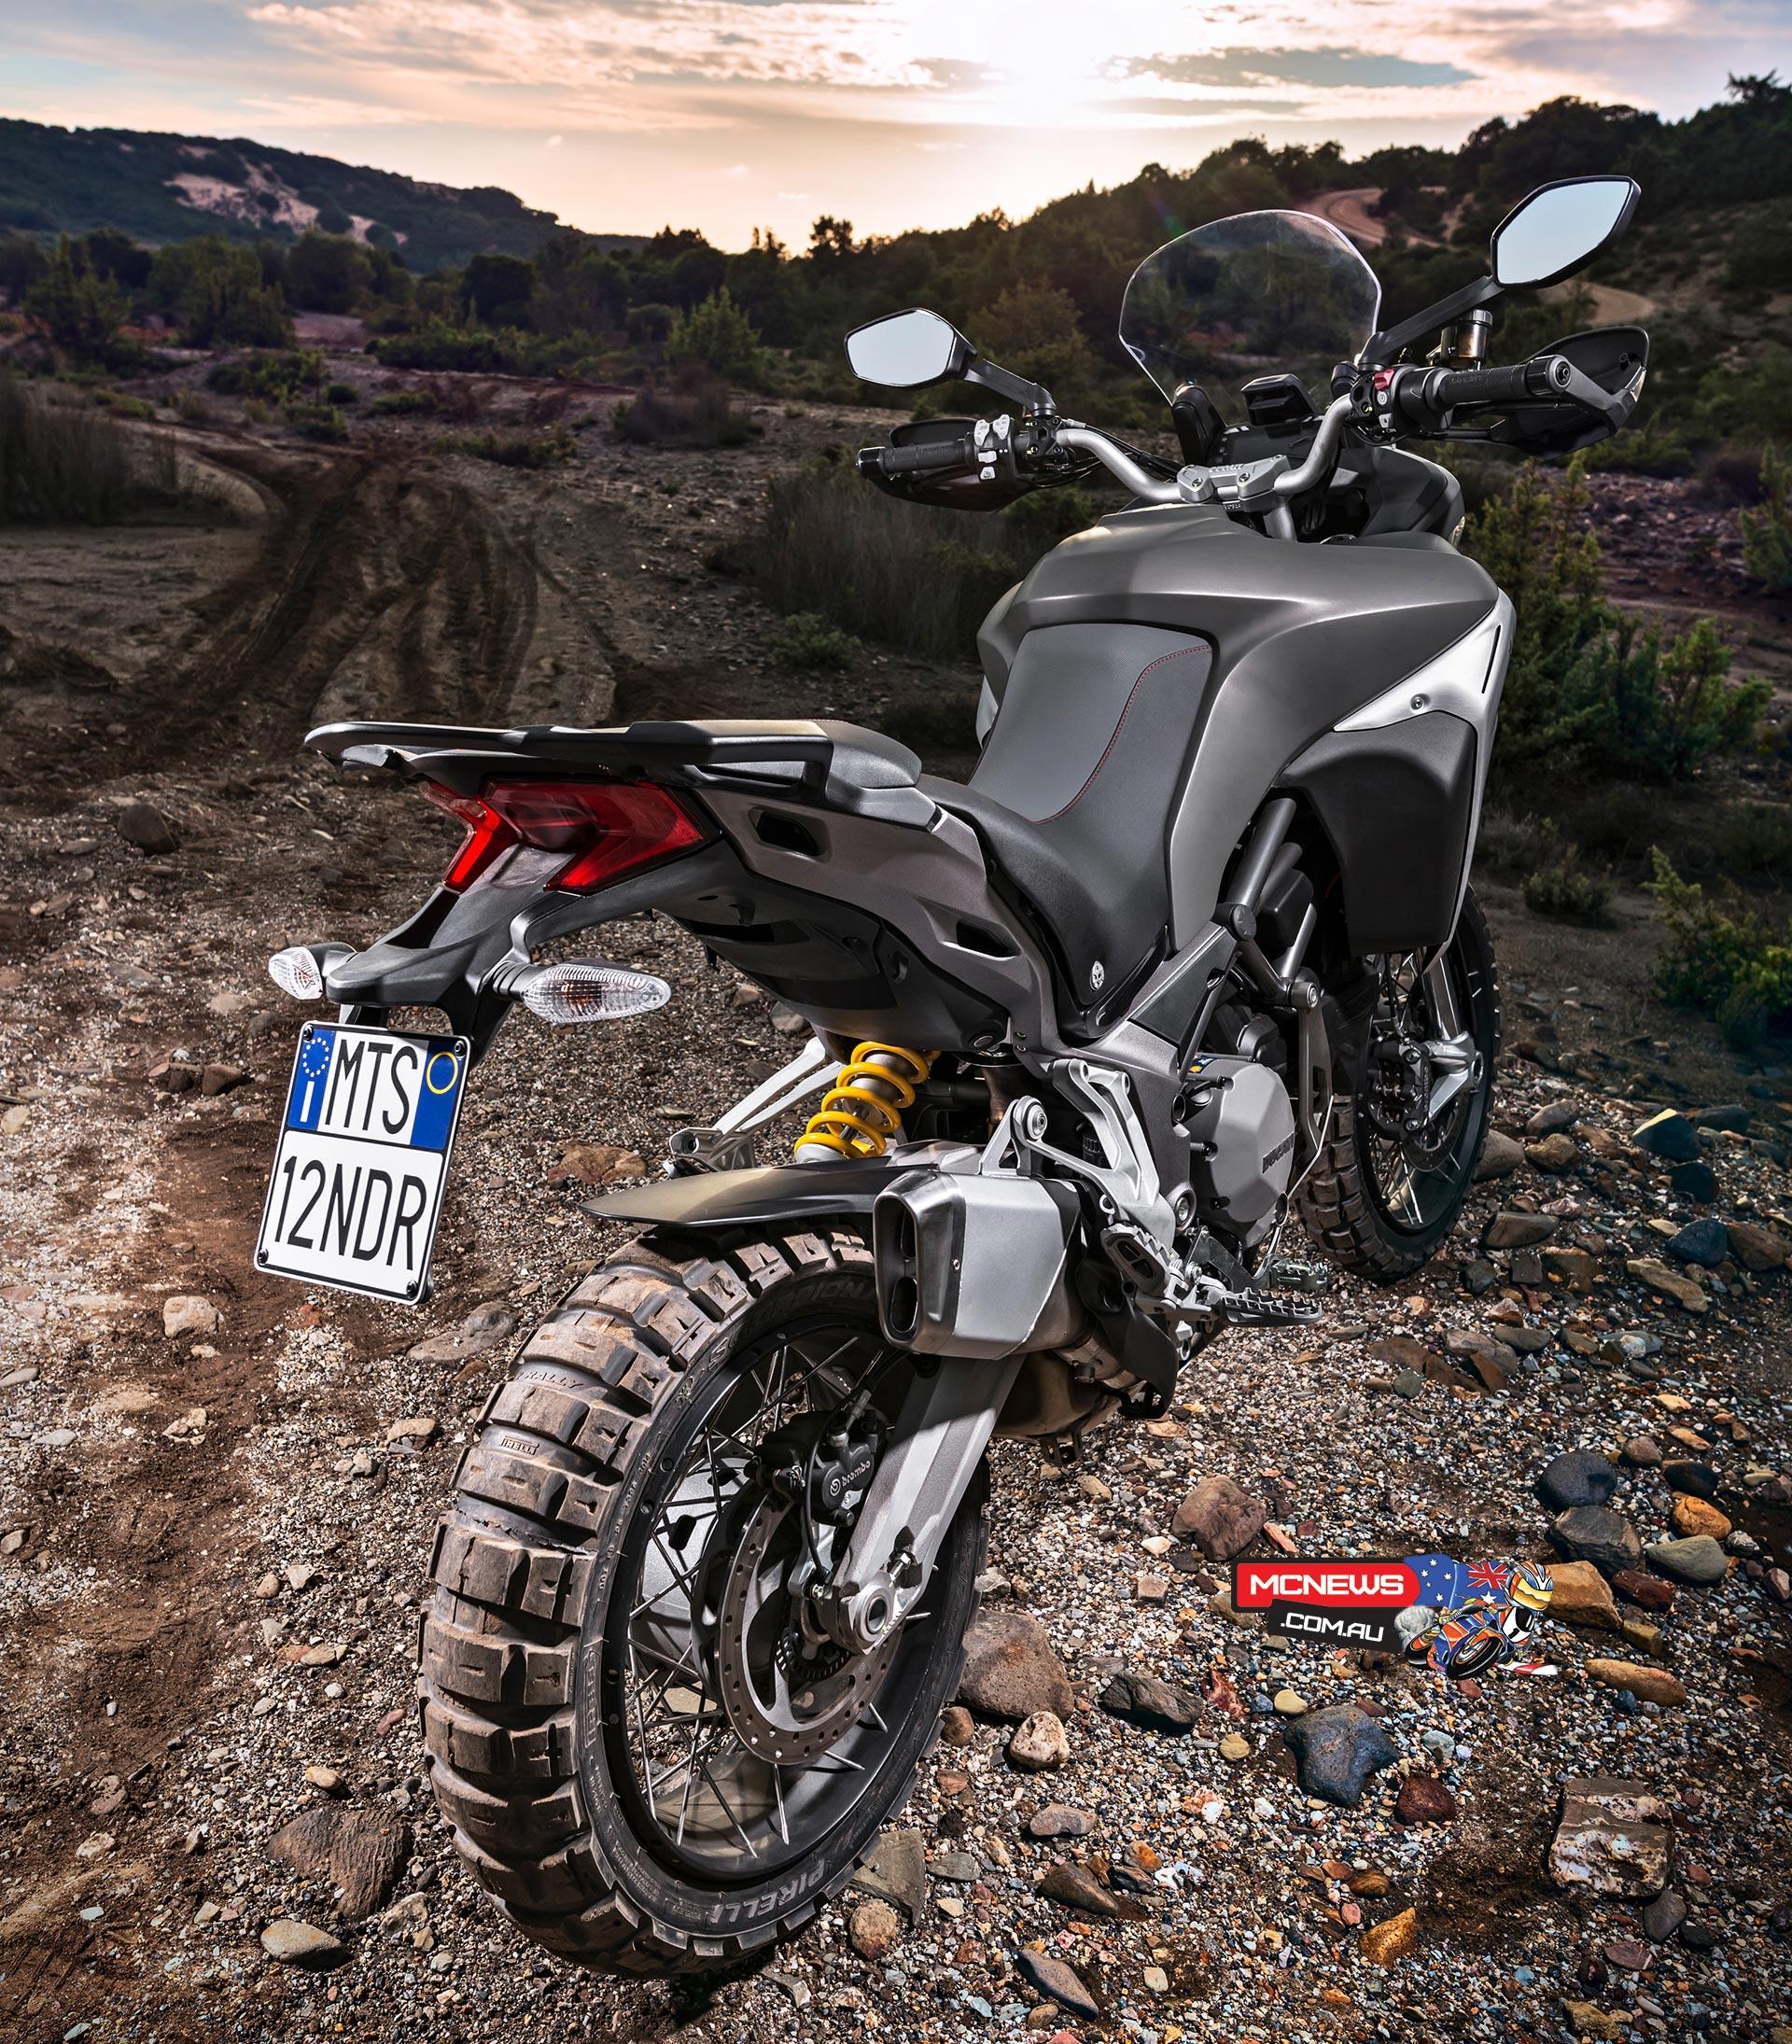 Ducati Multistrada Exhaust For Sale